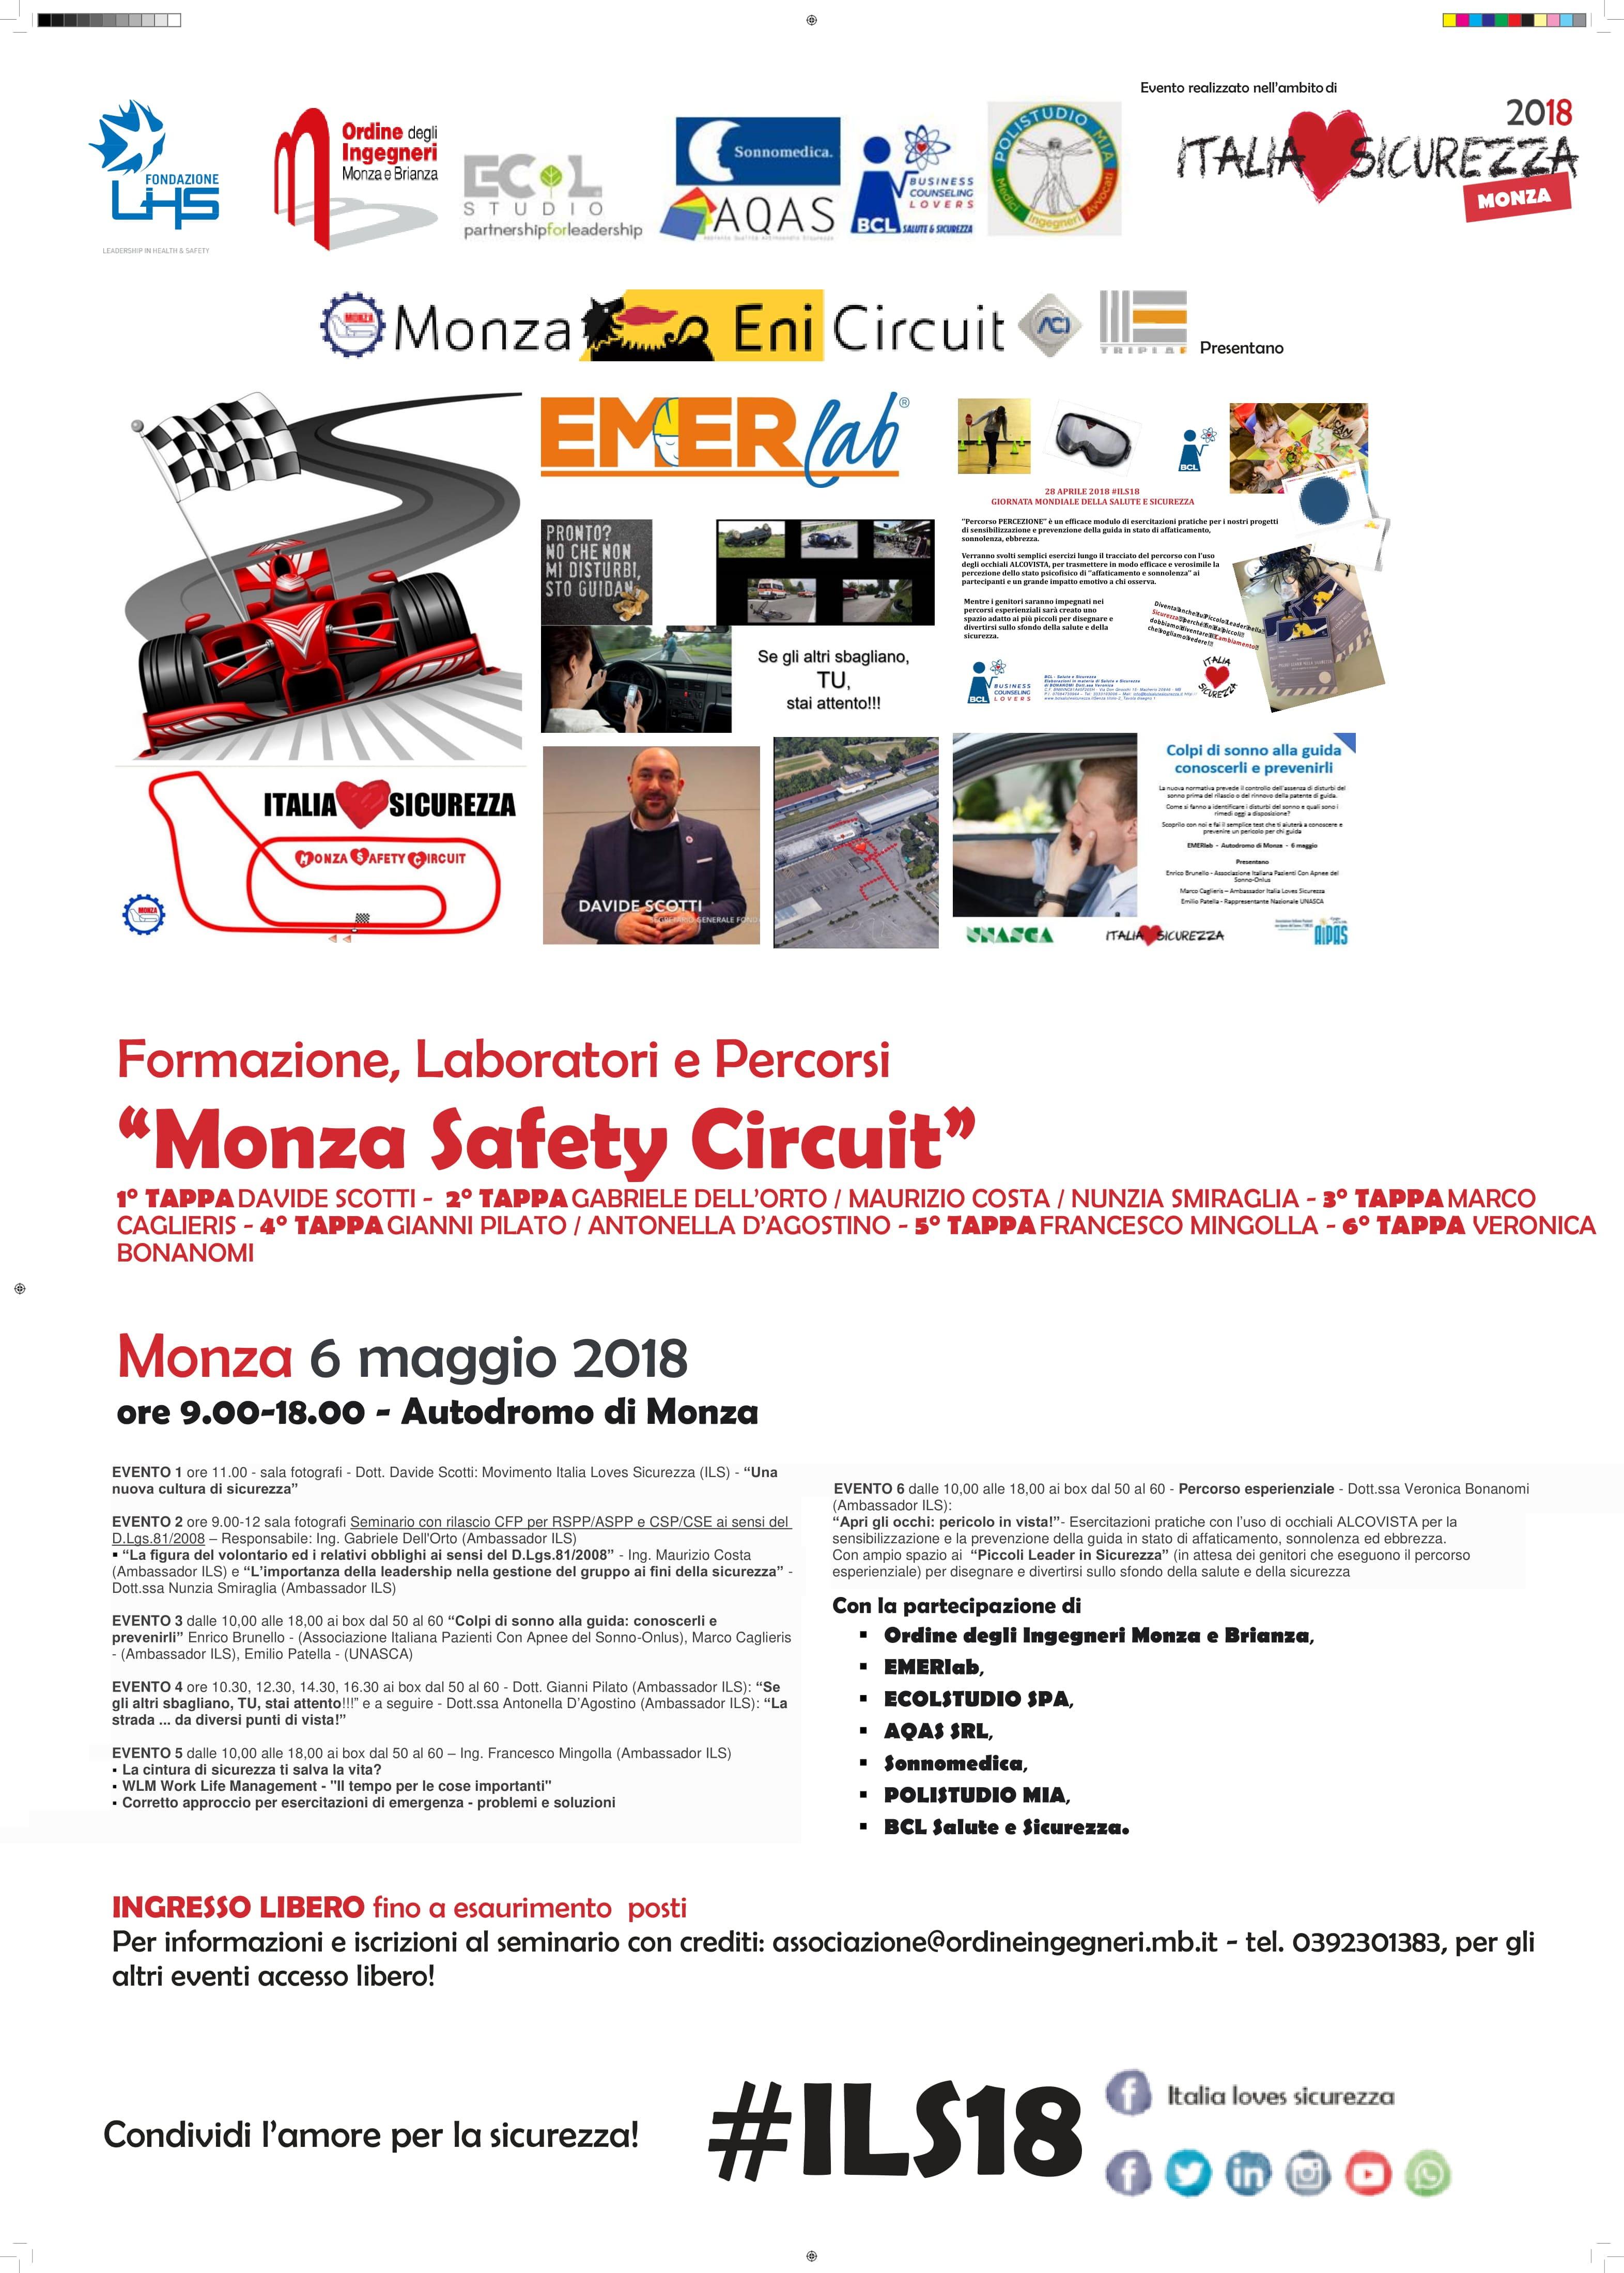 https://www.fondlhs.org/wp-content/uploads/2018/04/ILS18_Poster-Monza-Safety-Circuit-06-maggio-2018.jpg